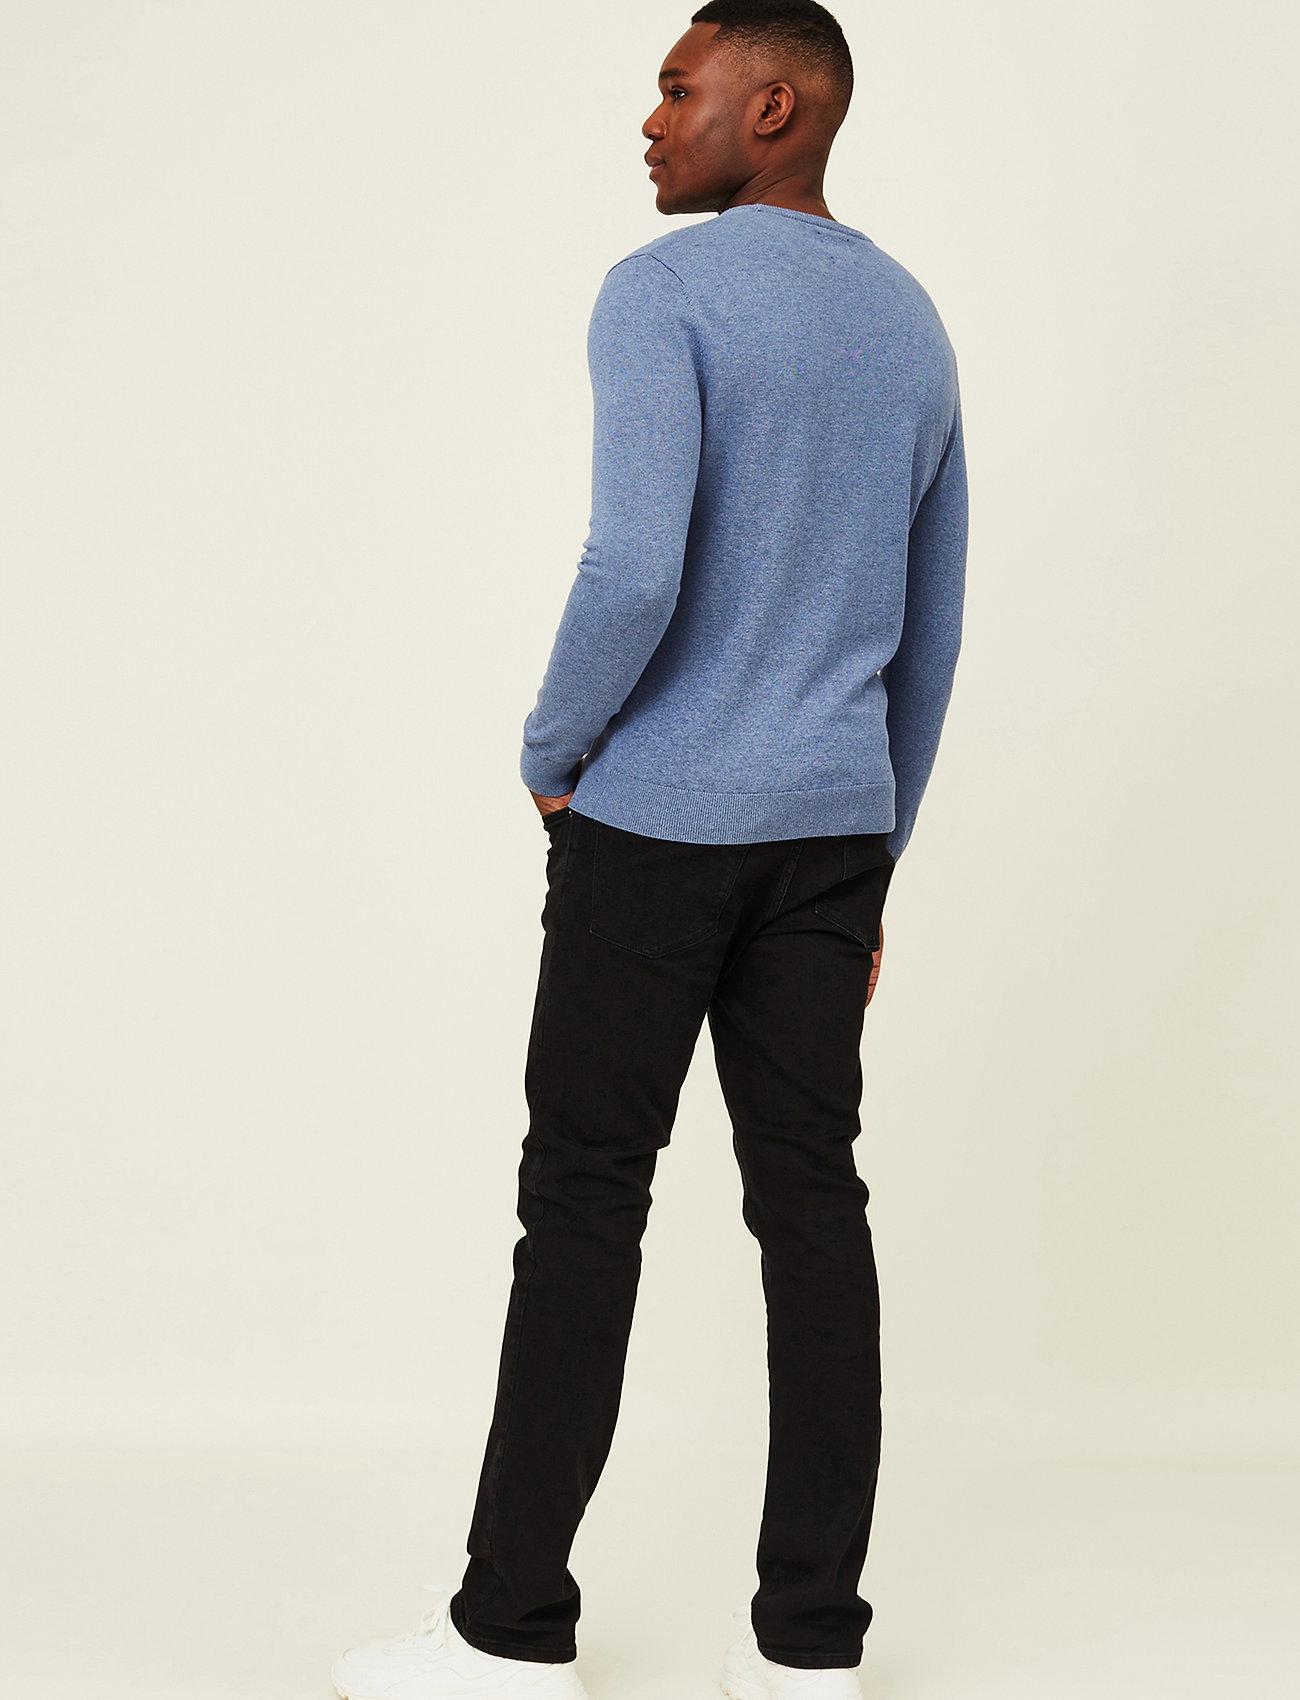 Lexington Clothing - Bradley Organic Cotton Crew Neck Sweater - basic gebreide truien - blue melange - 3